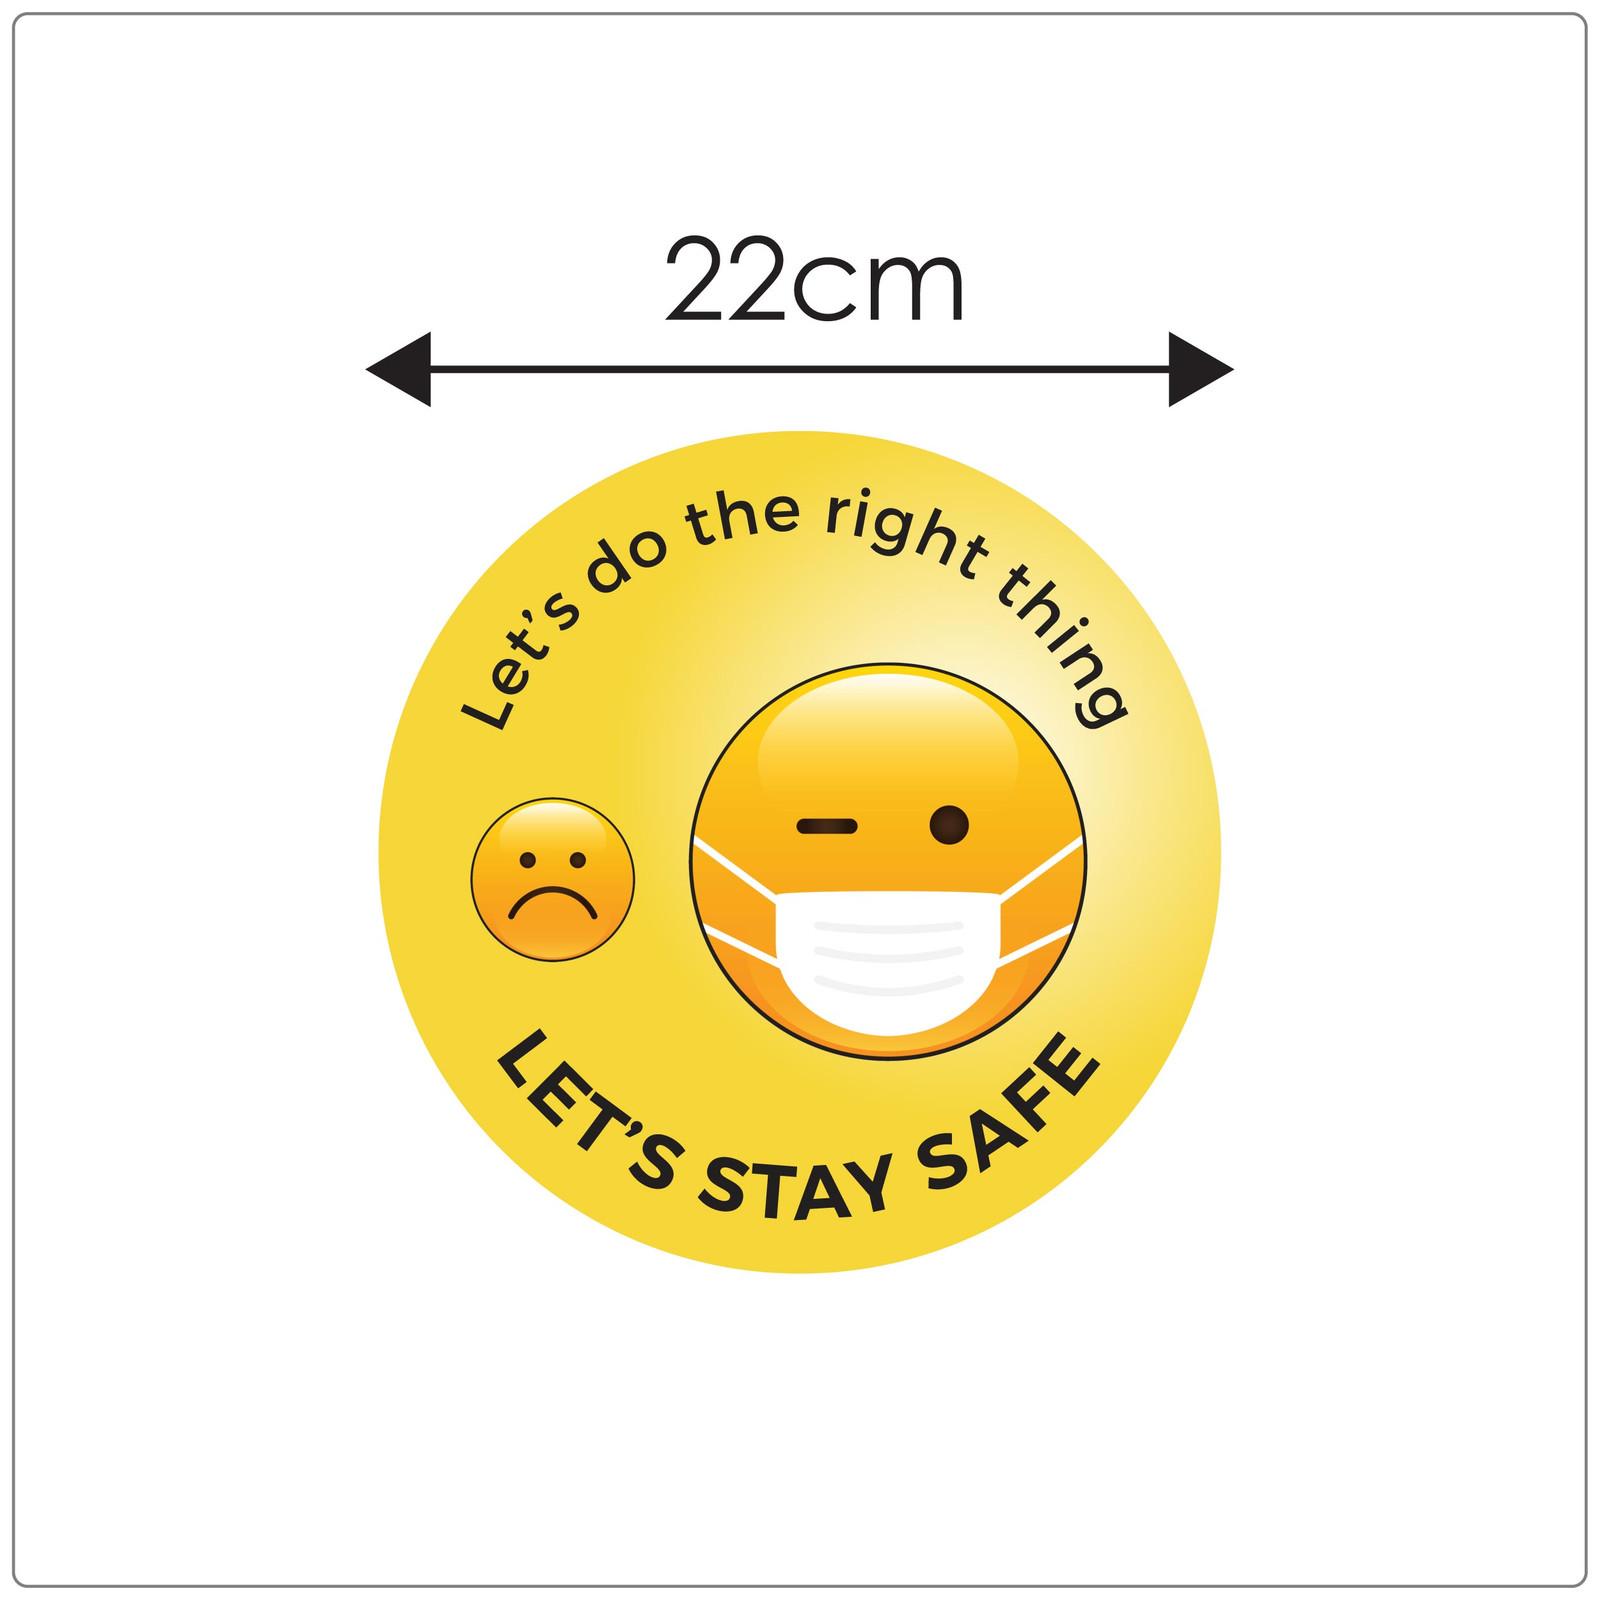 COVID mask sticker,  emoji, sizing Self-adhesive face mask sticker to encourage mask wearing.